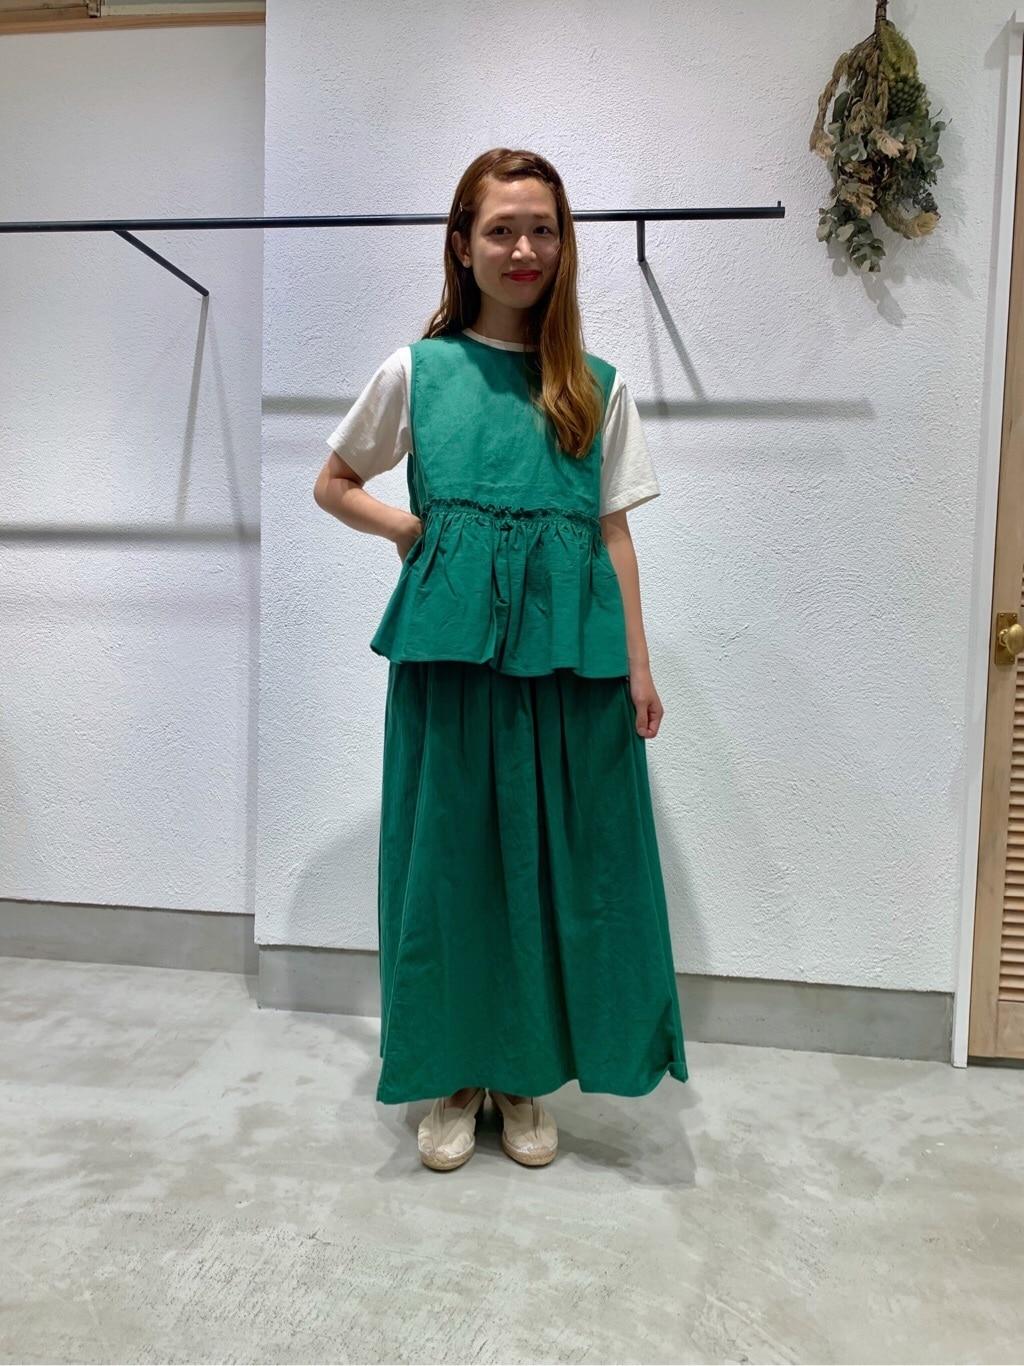 chambre de charme 横浜ジョイナス 身長:160cm 2020.06.16